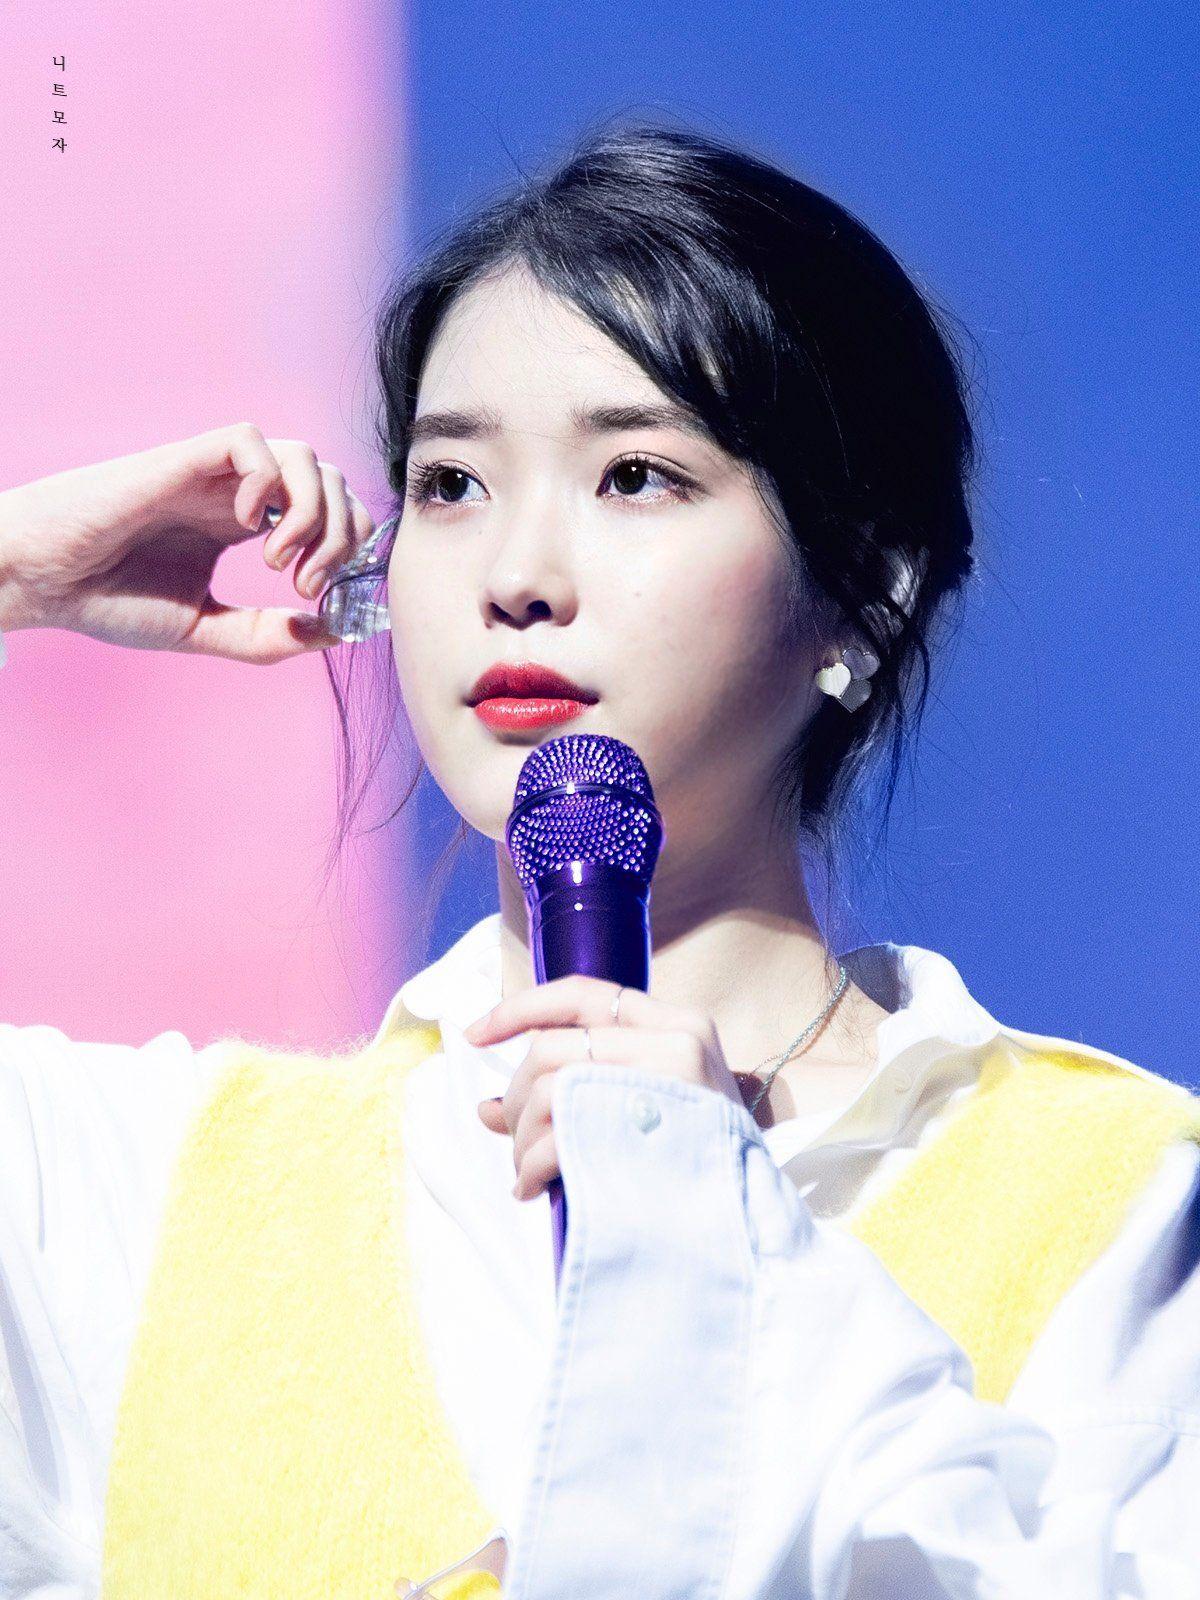 190921 11th Debut Anniversary FM Cr 니트모자 Singer, Korean